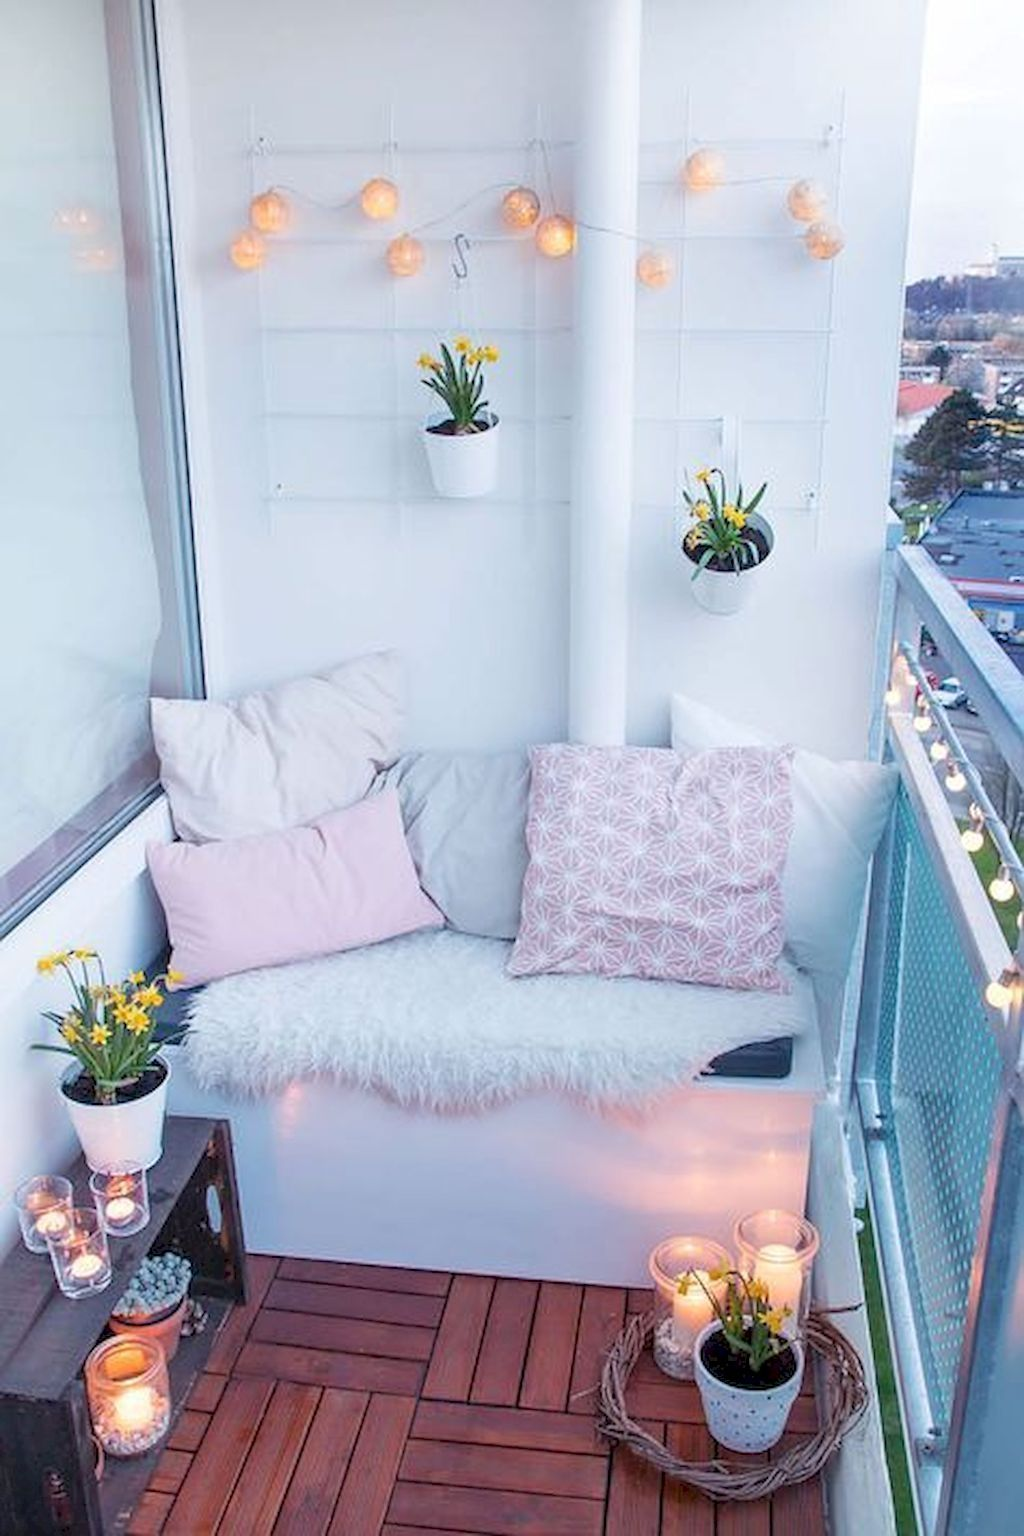 Cozy Balcony Decorating Ideas: 65 Cozy Apartment Balcony Decorating Ideas